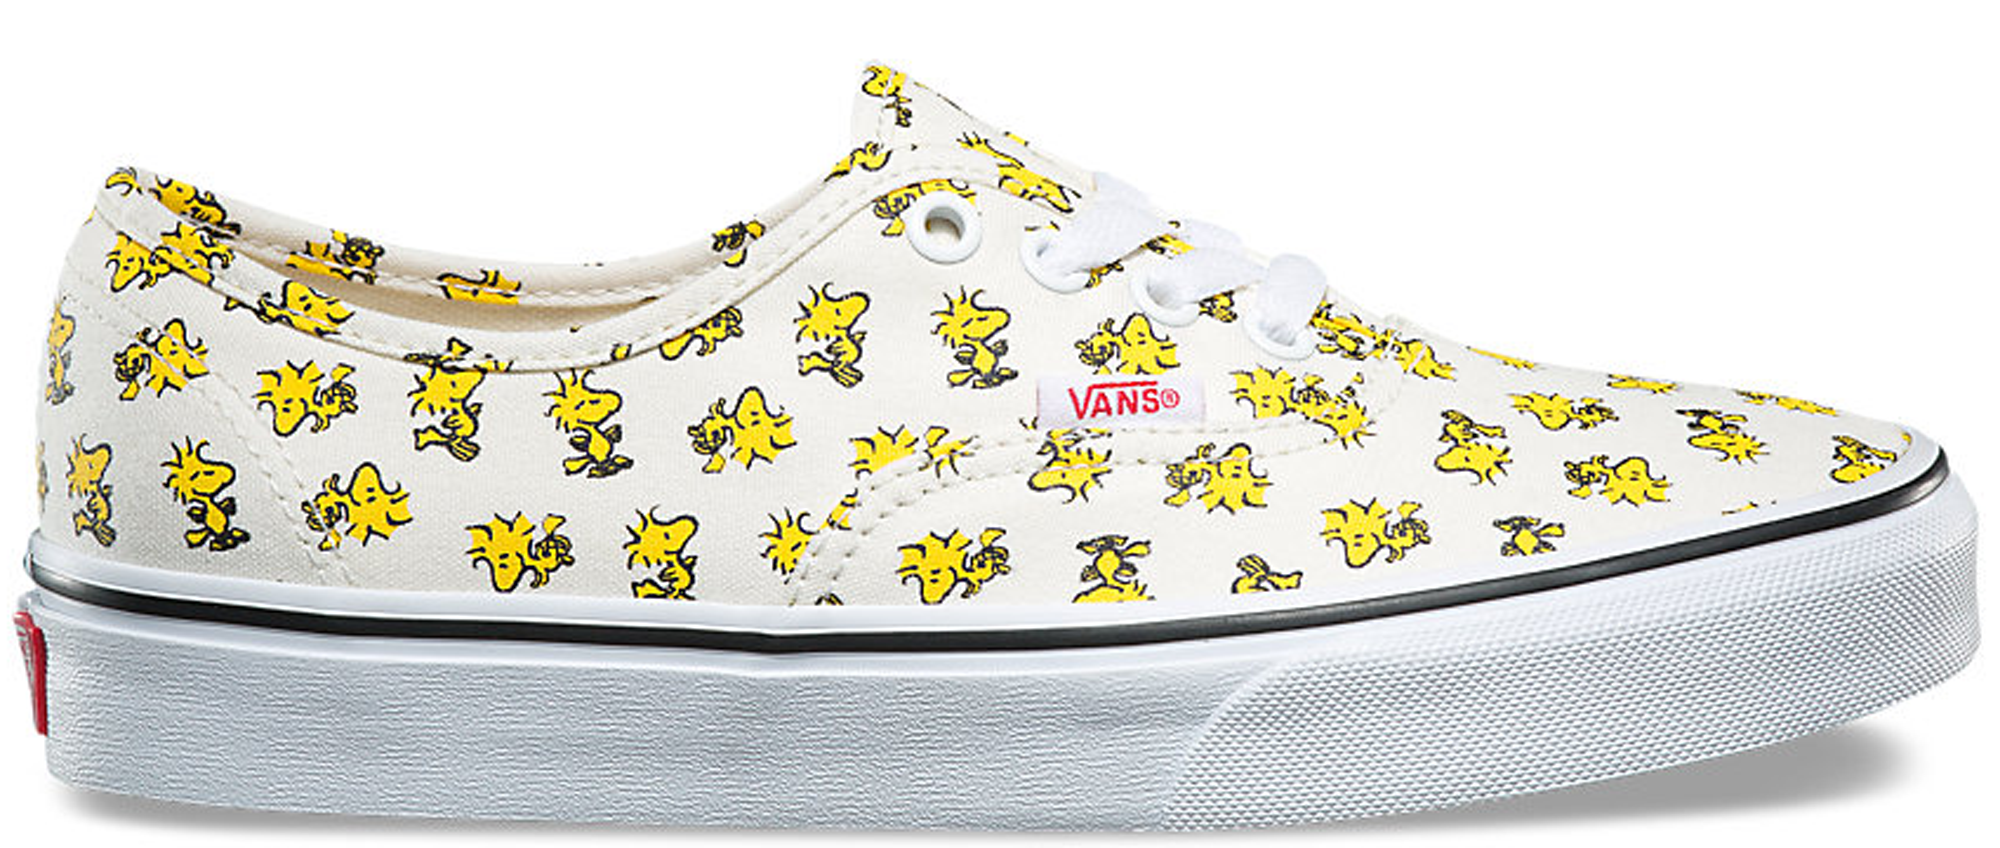 Vans Authentic Peanuts Woodstock